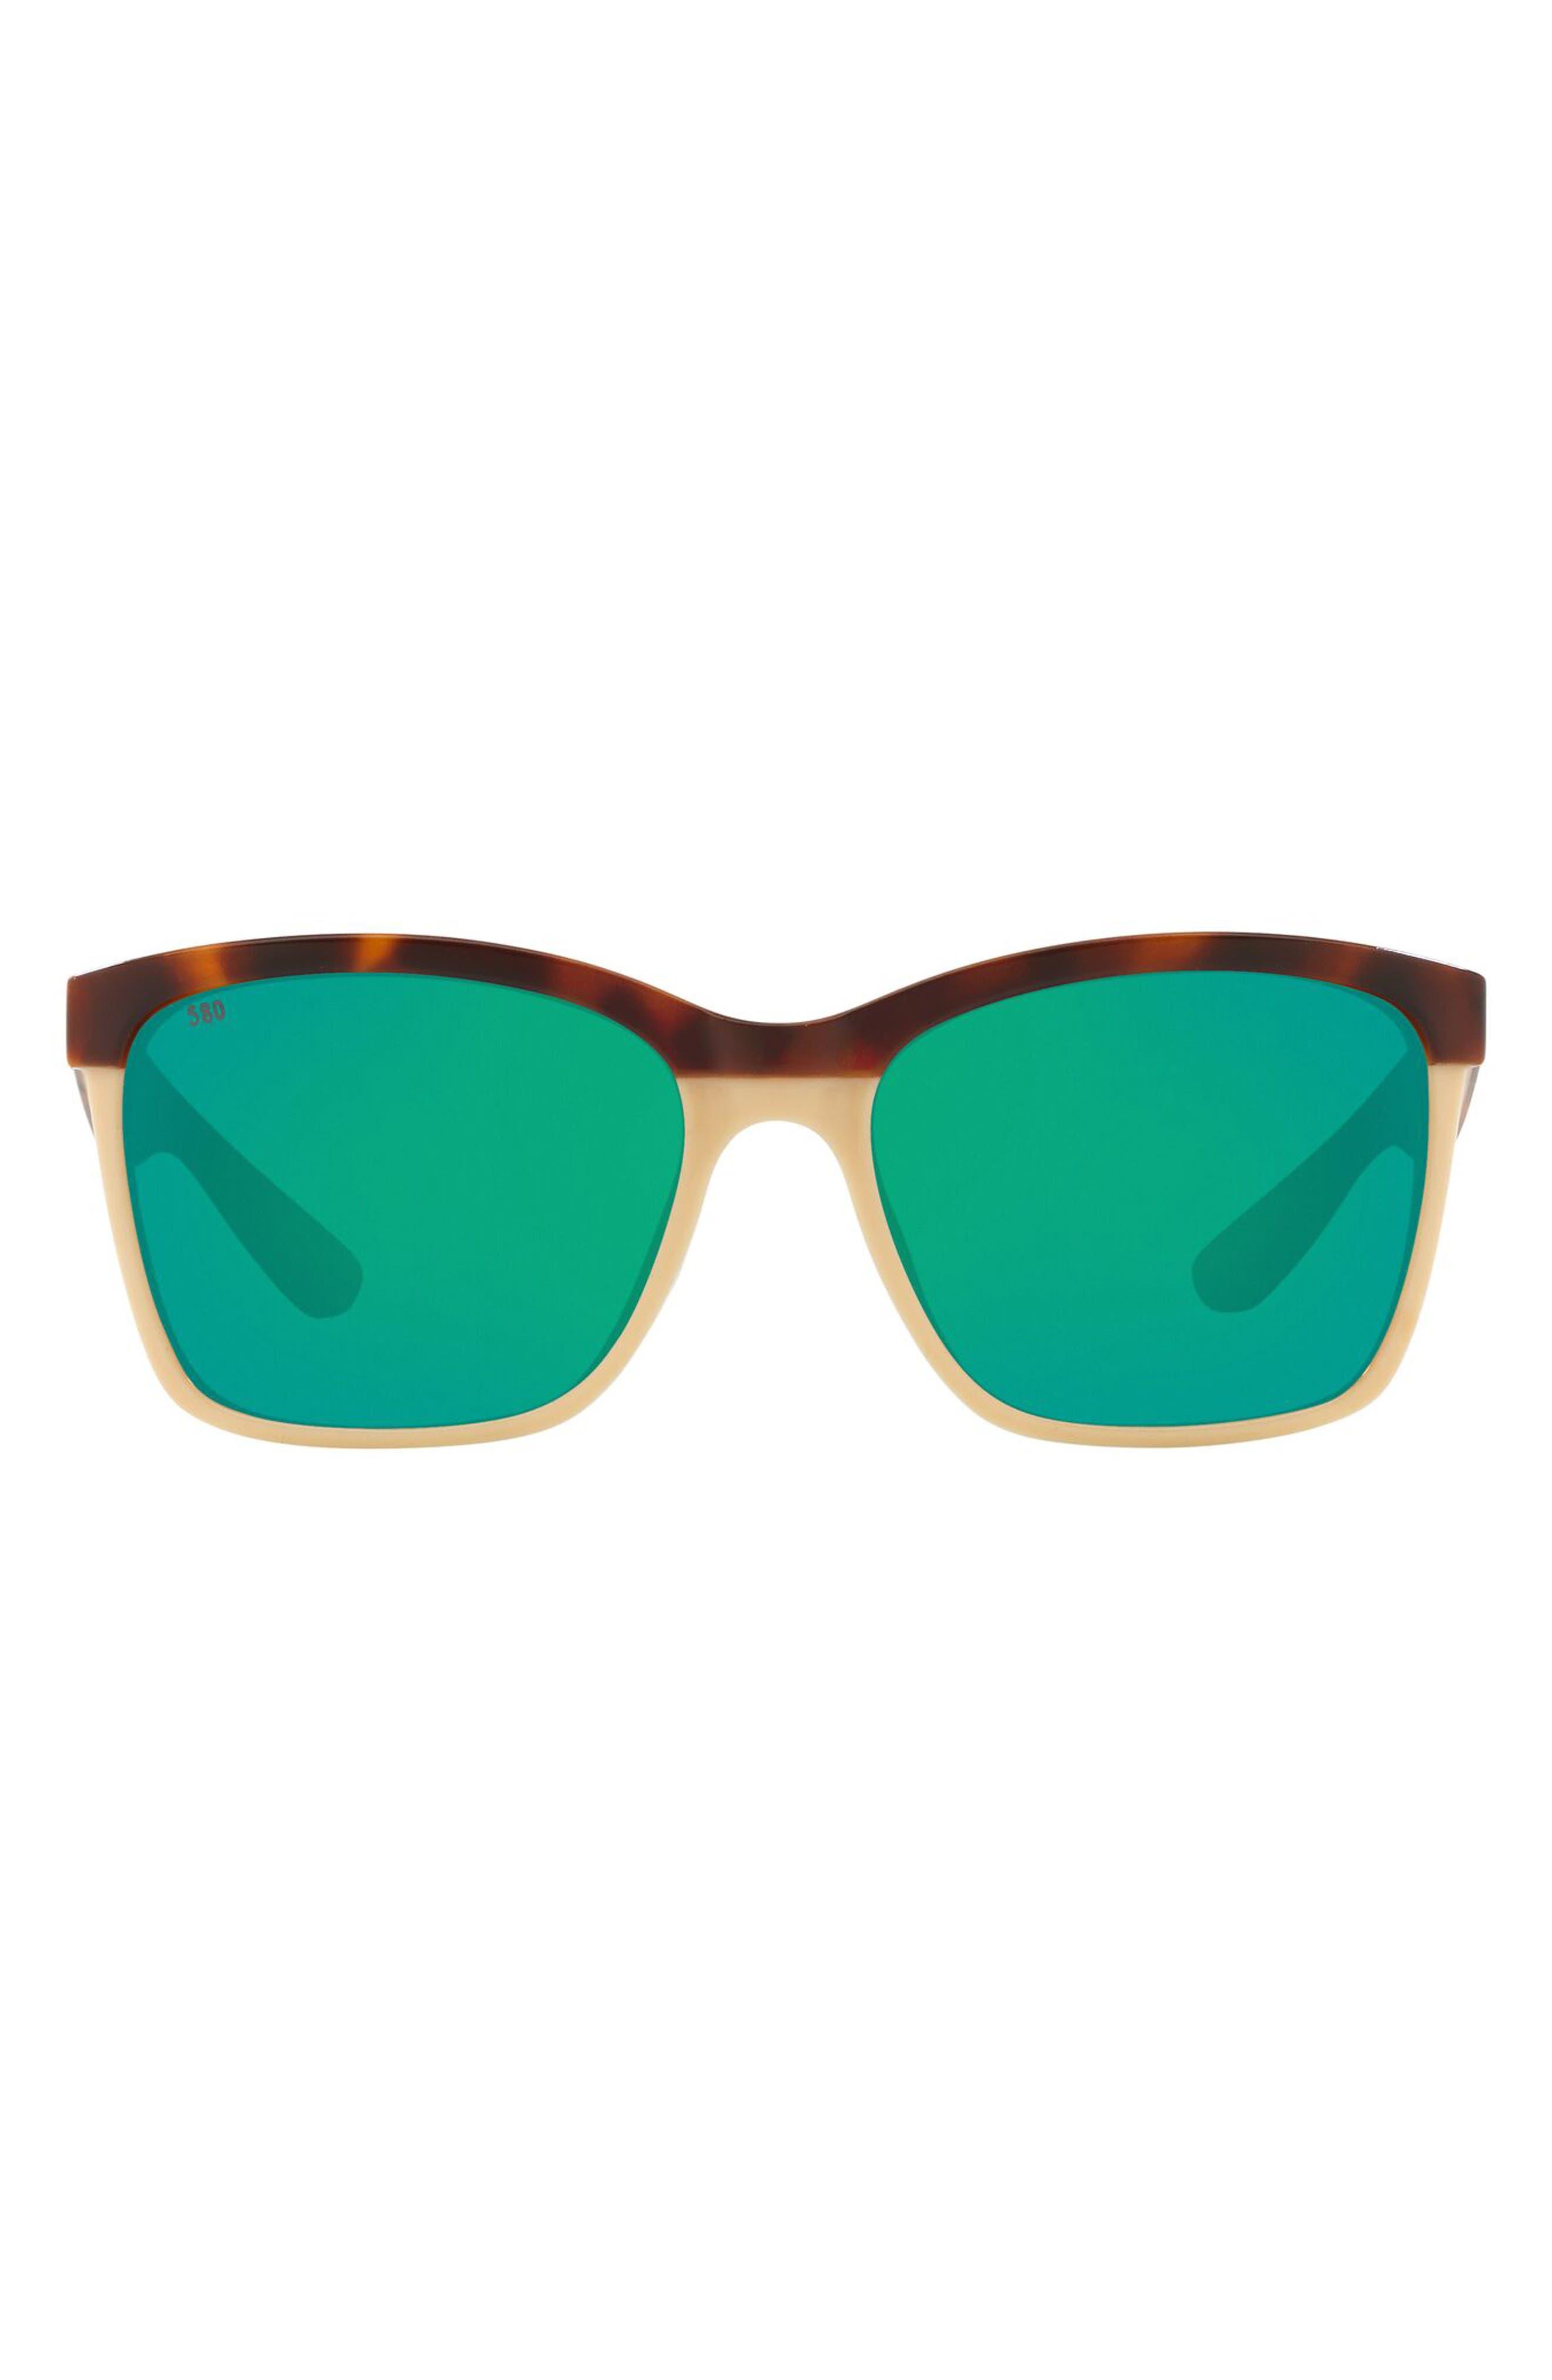 55mm Polarized Square Sunglasses